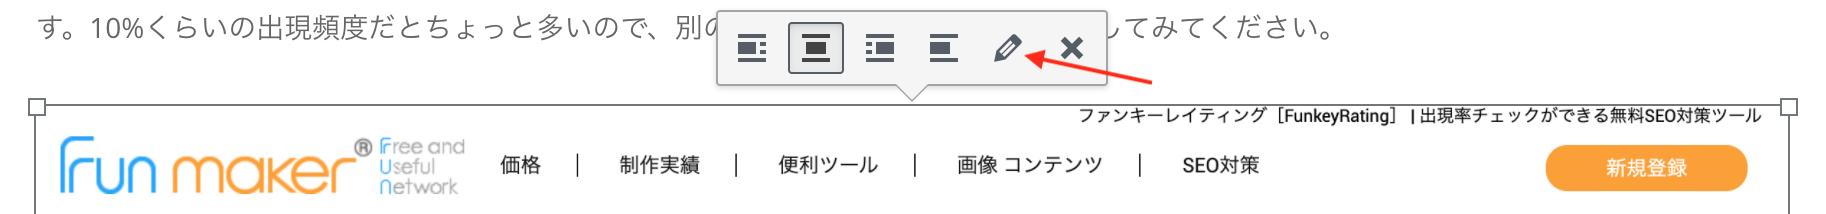 altタグの設定 画像の編集アイコンをクリック